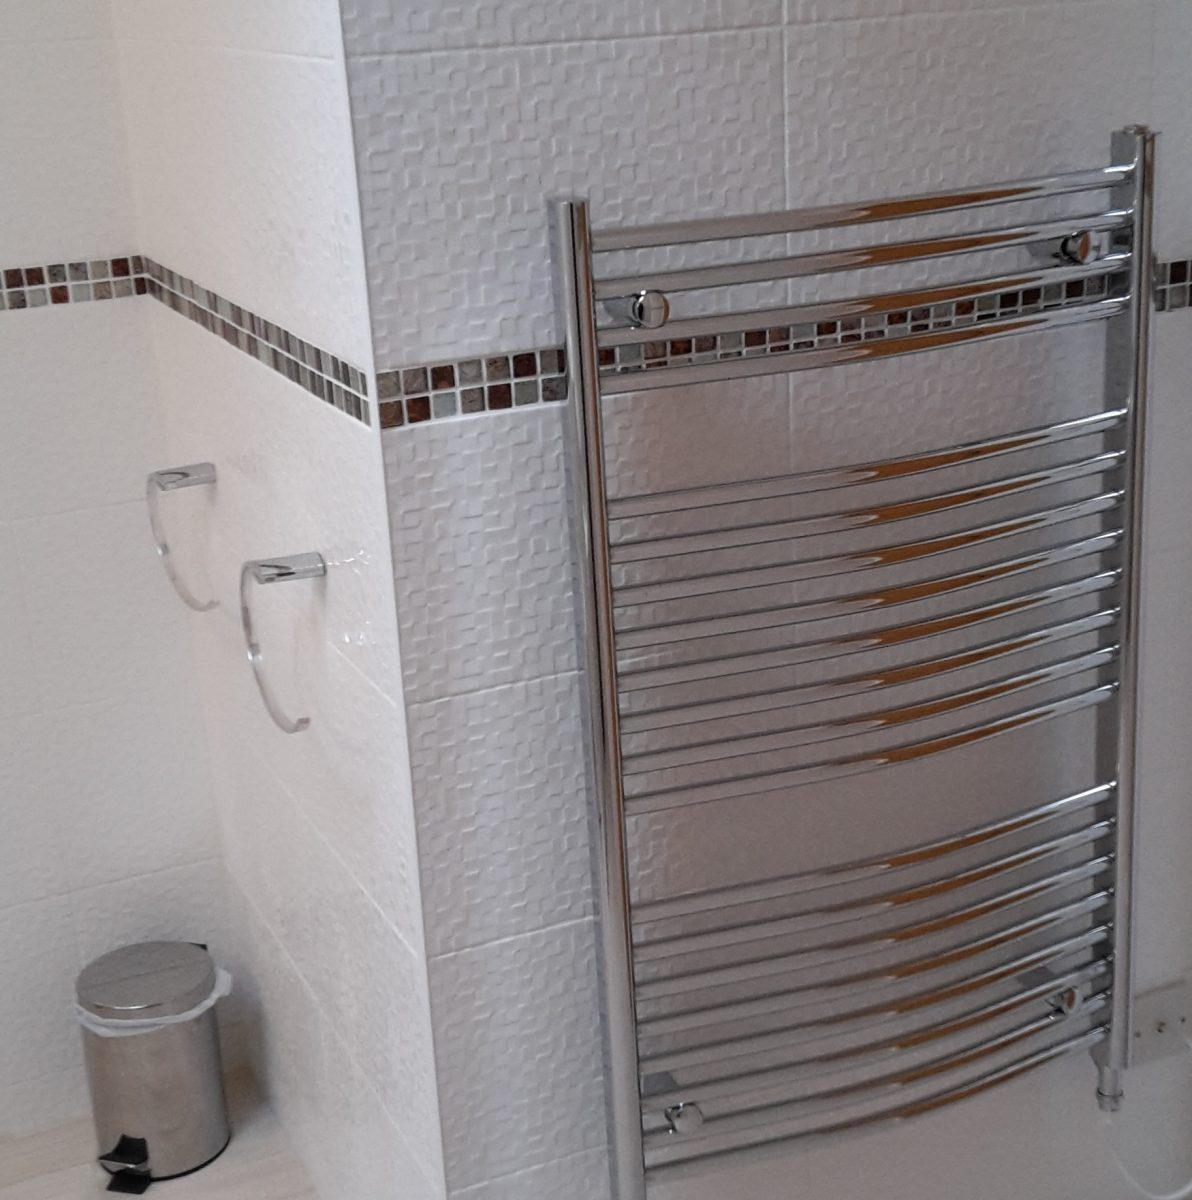 Noosa Sound bathroom towel rail